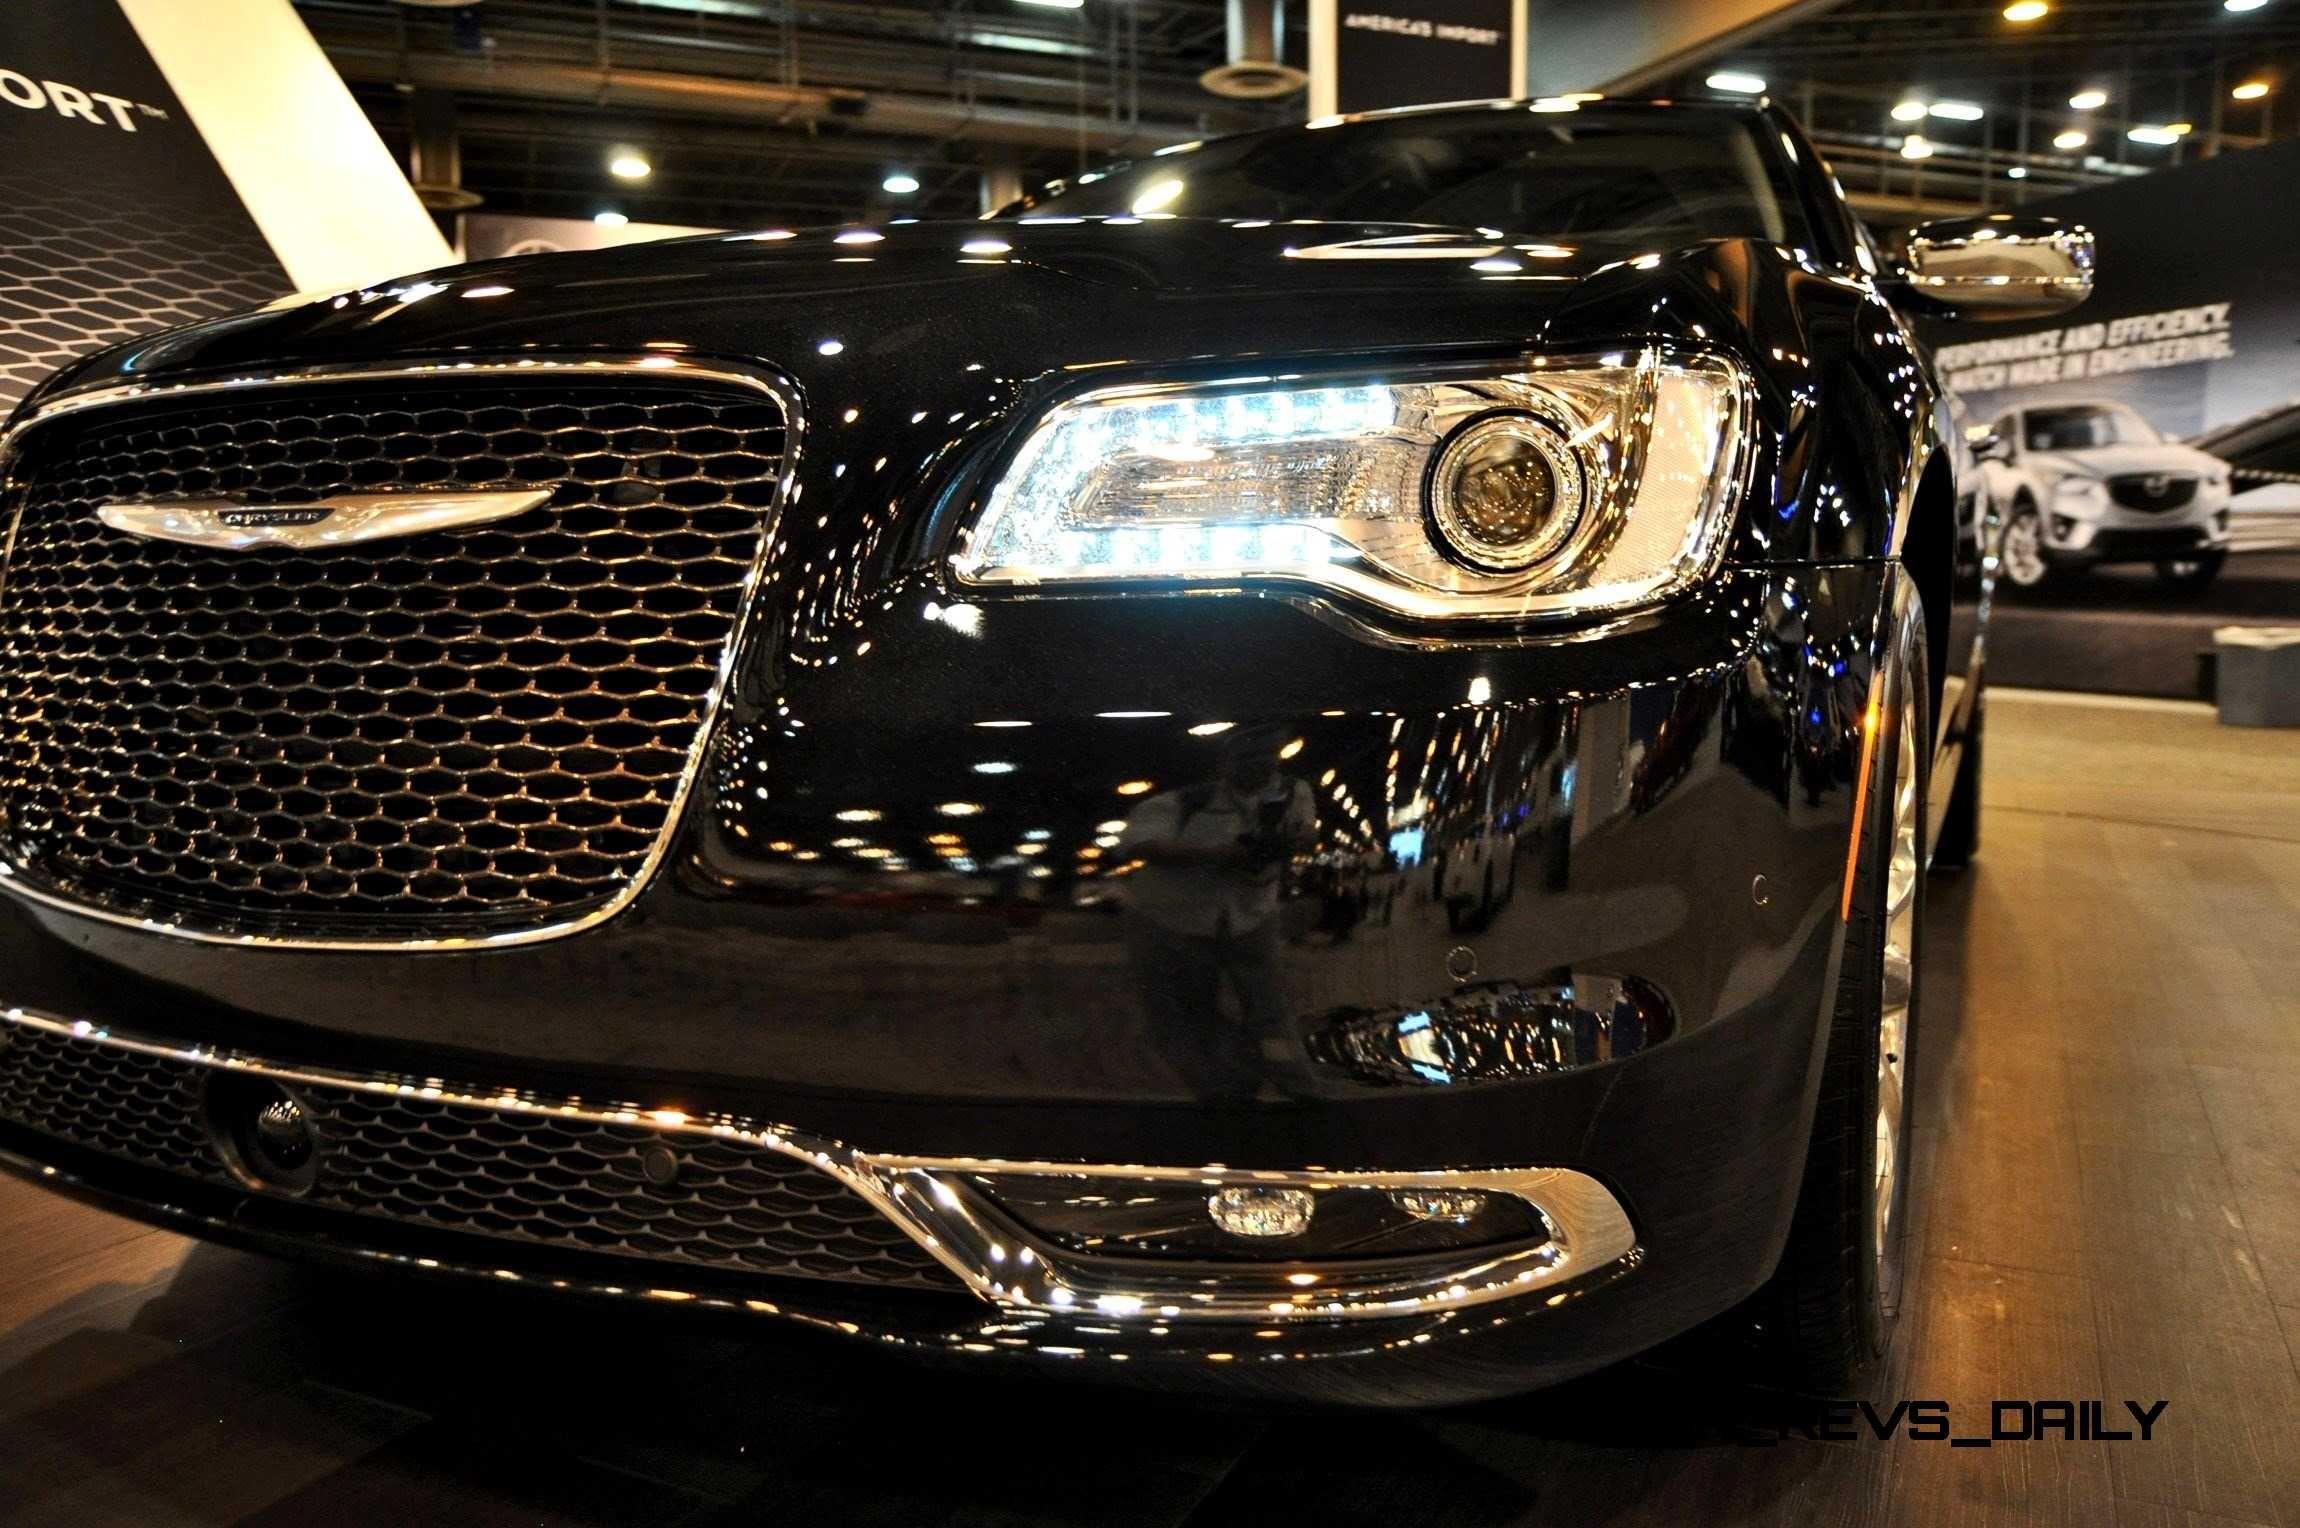 2015 Chrysler 300c Chrysler Cars Chrysler 300c Chrysler 300